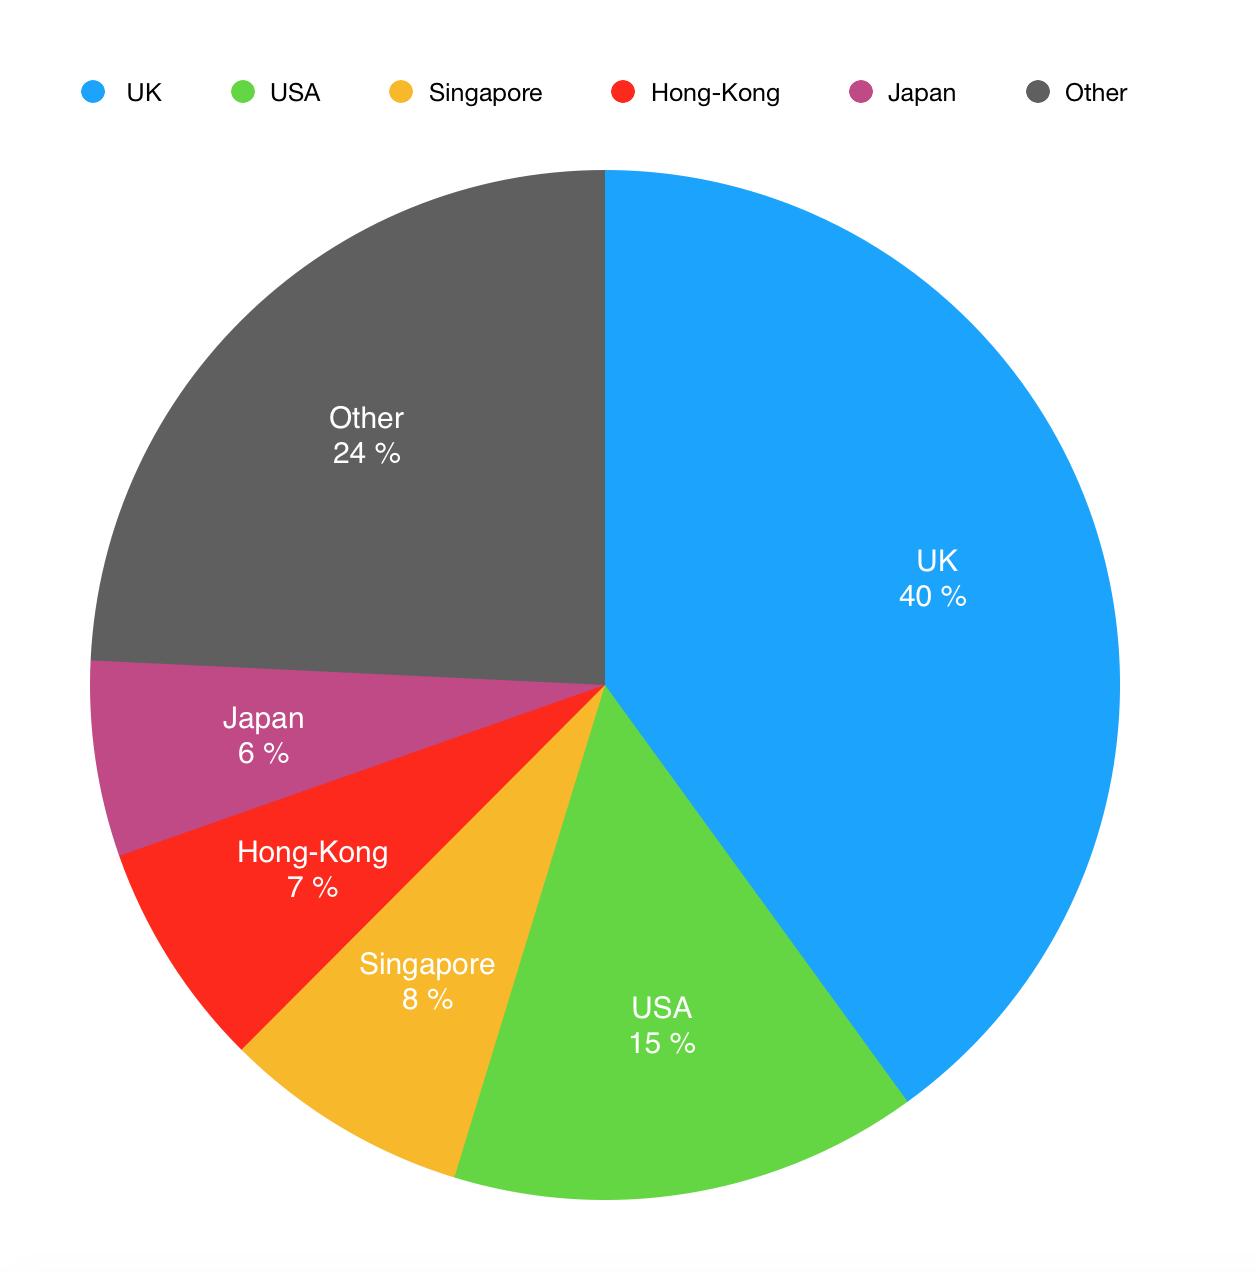 Структура рынка форекс по странам